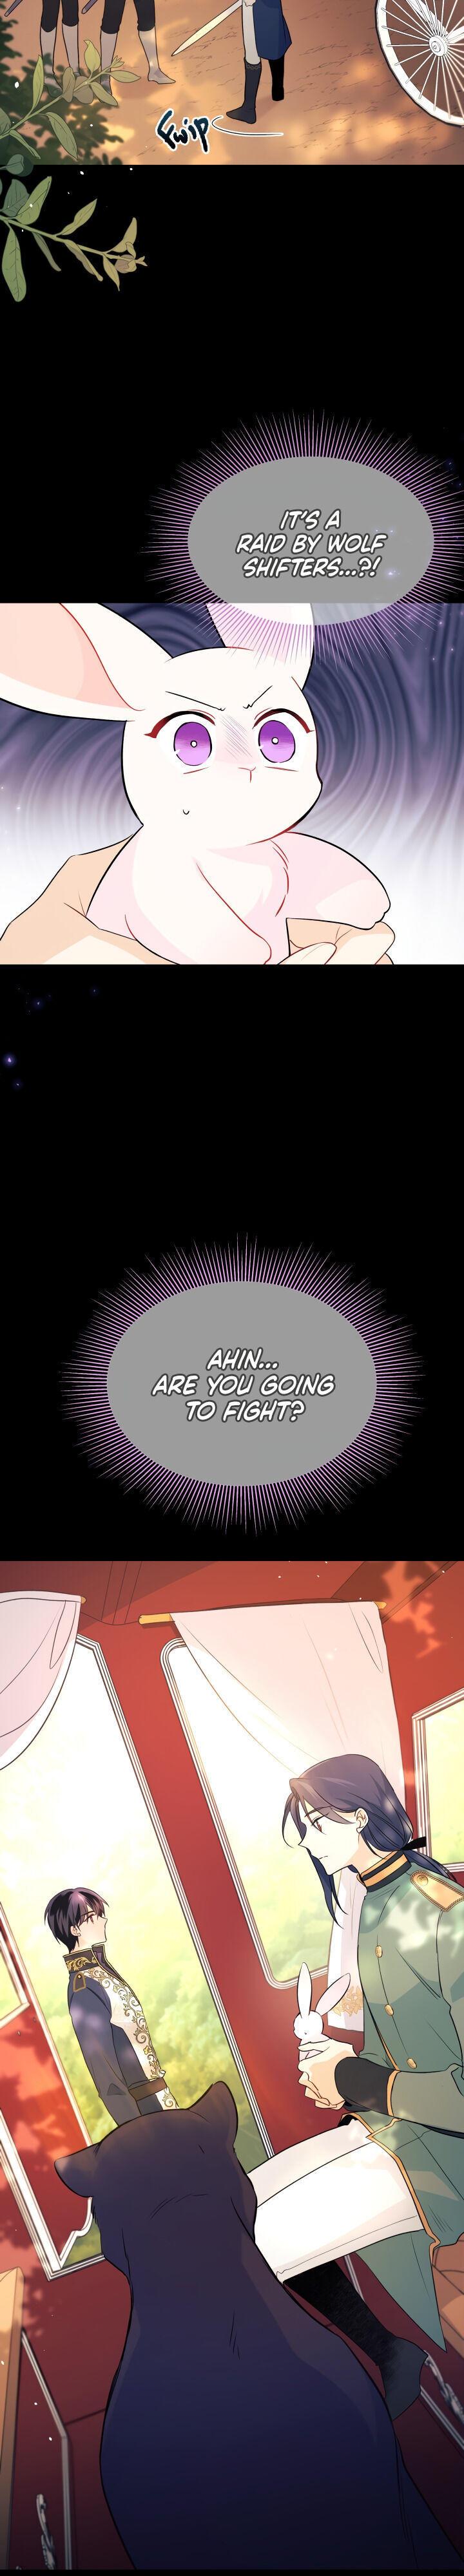 A Symbiotic Relationship Between A Rabbit And A Black Panther Chapter 27 page 4 - Mangakakalots.com